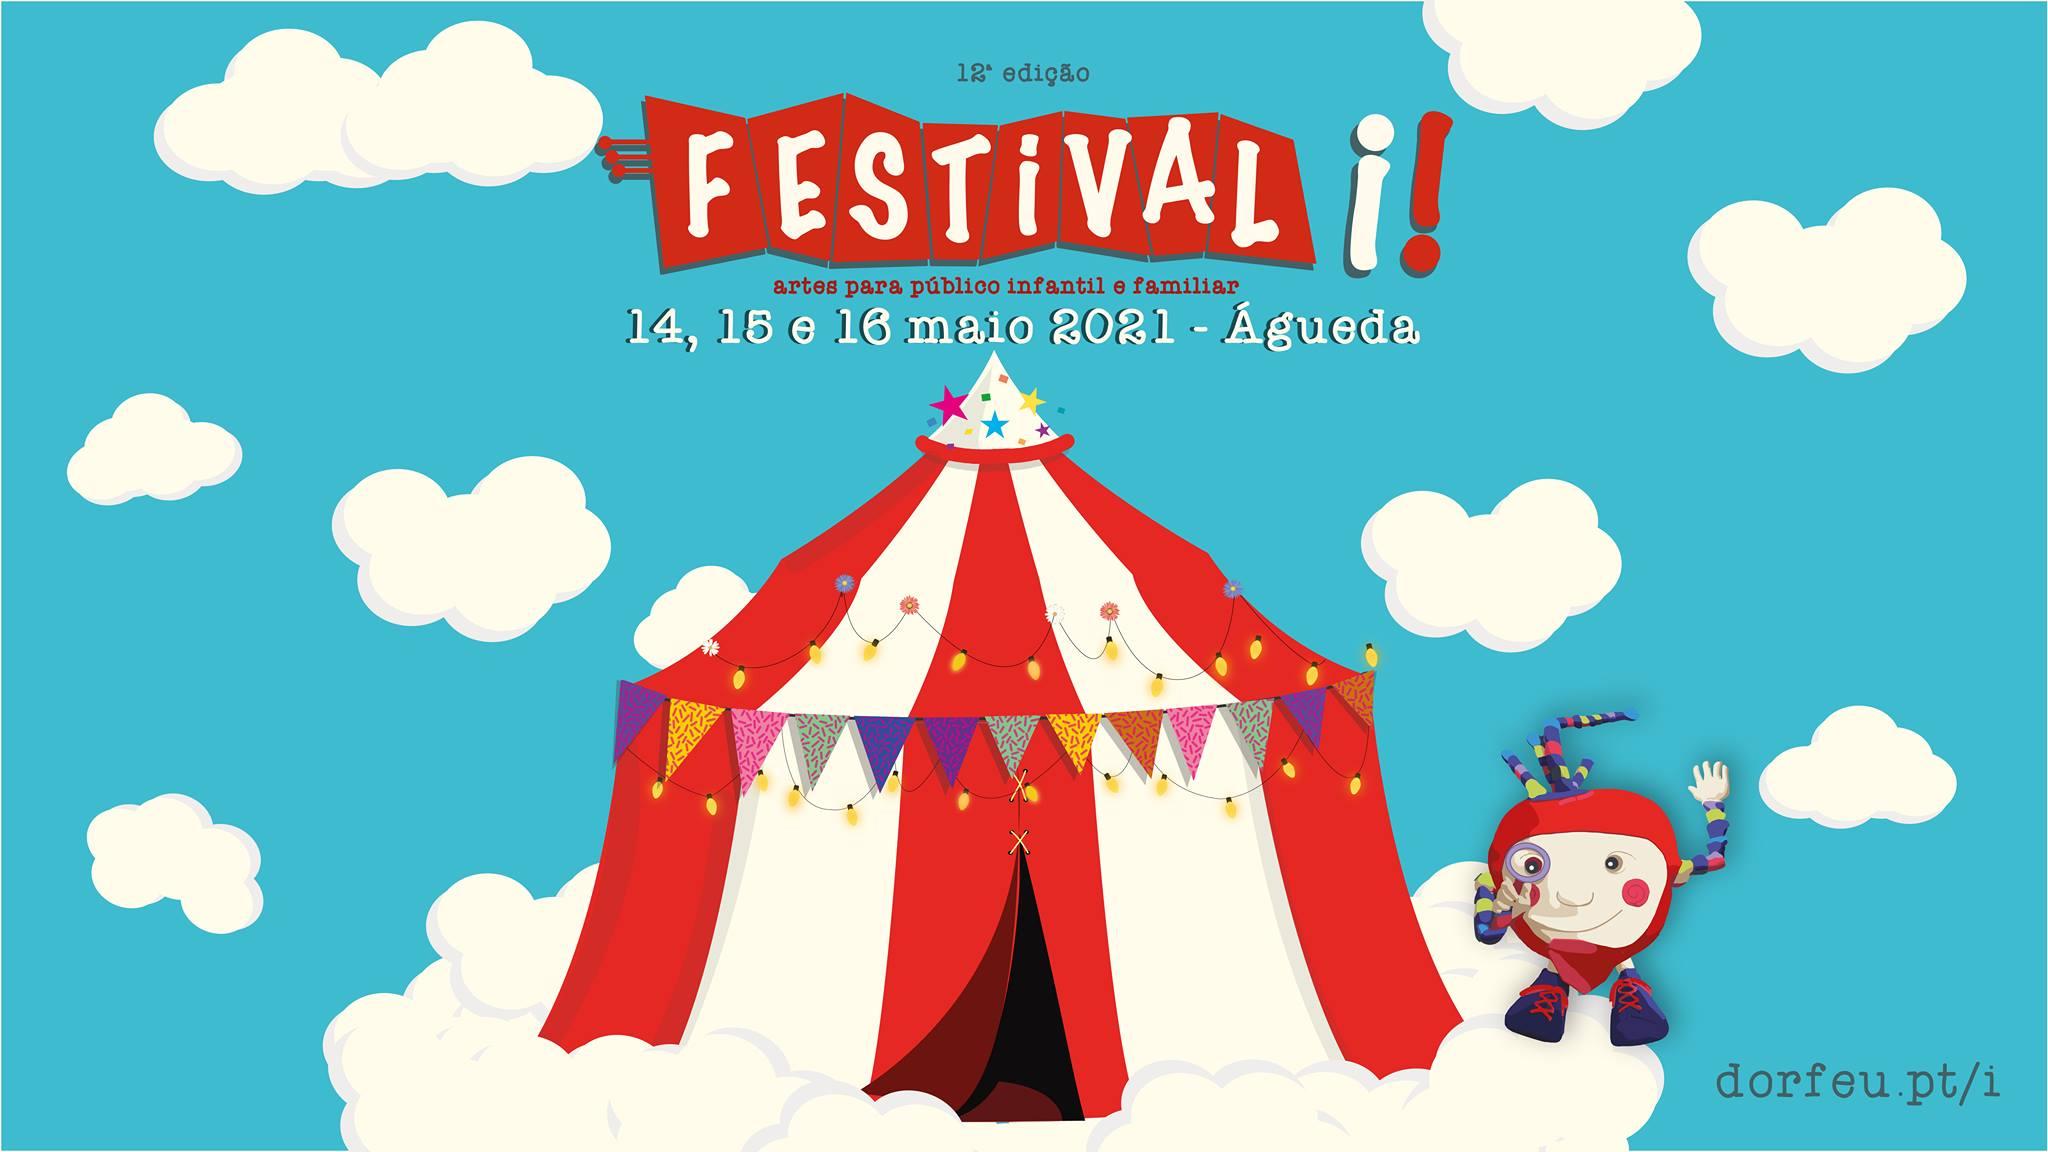 Festival i! 2021